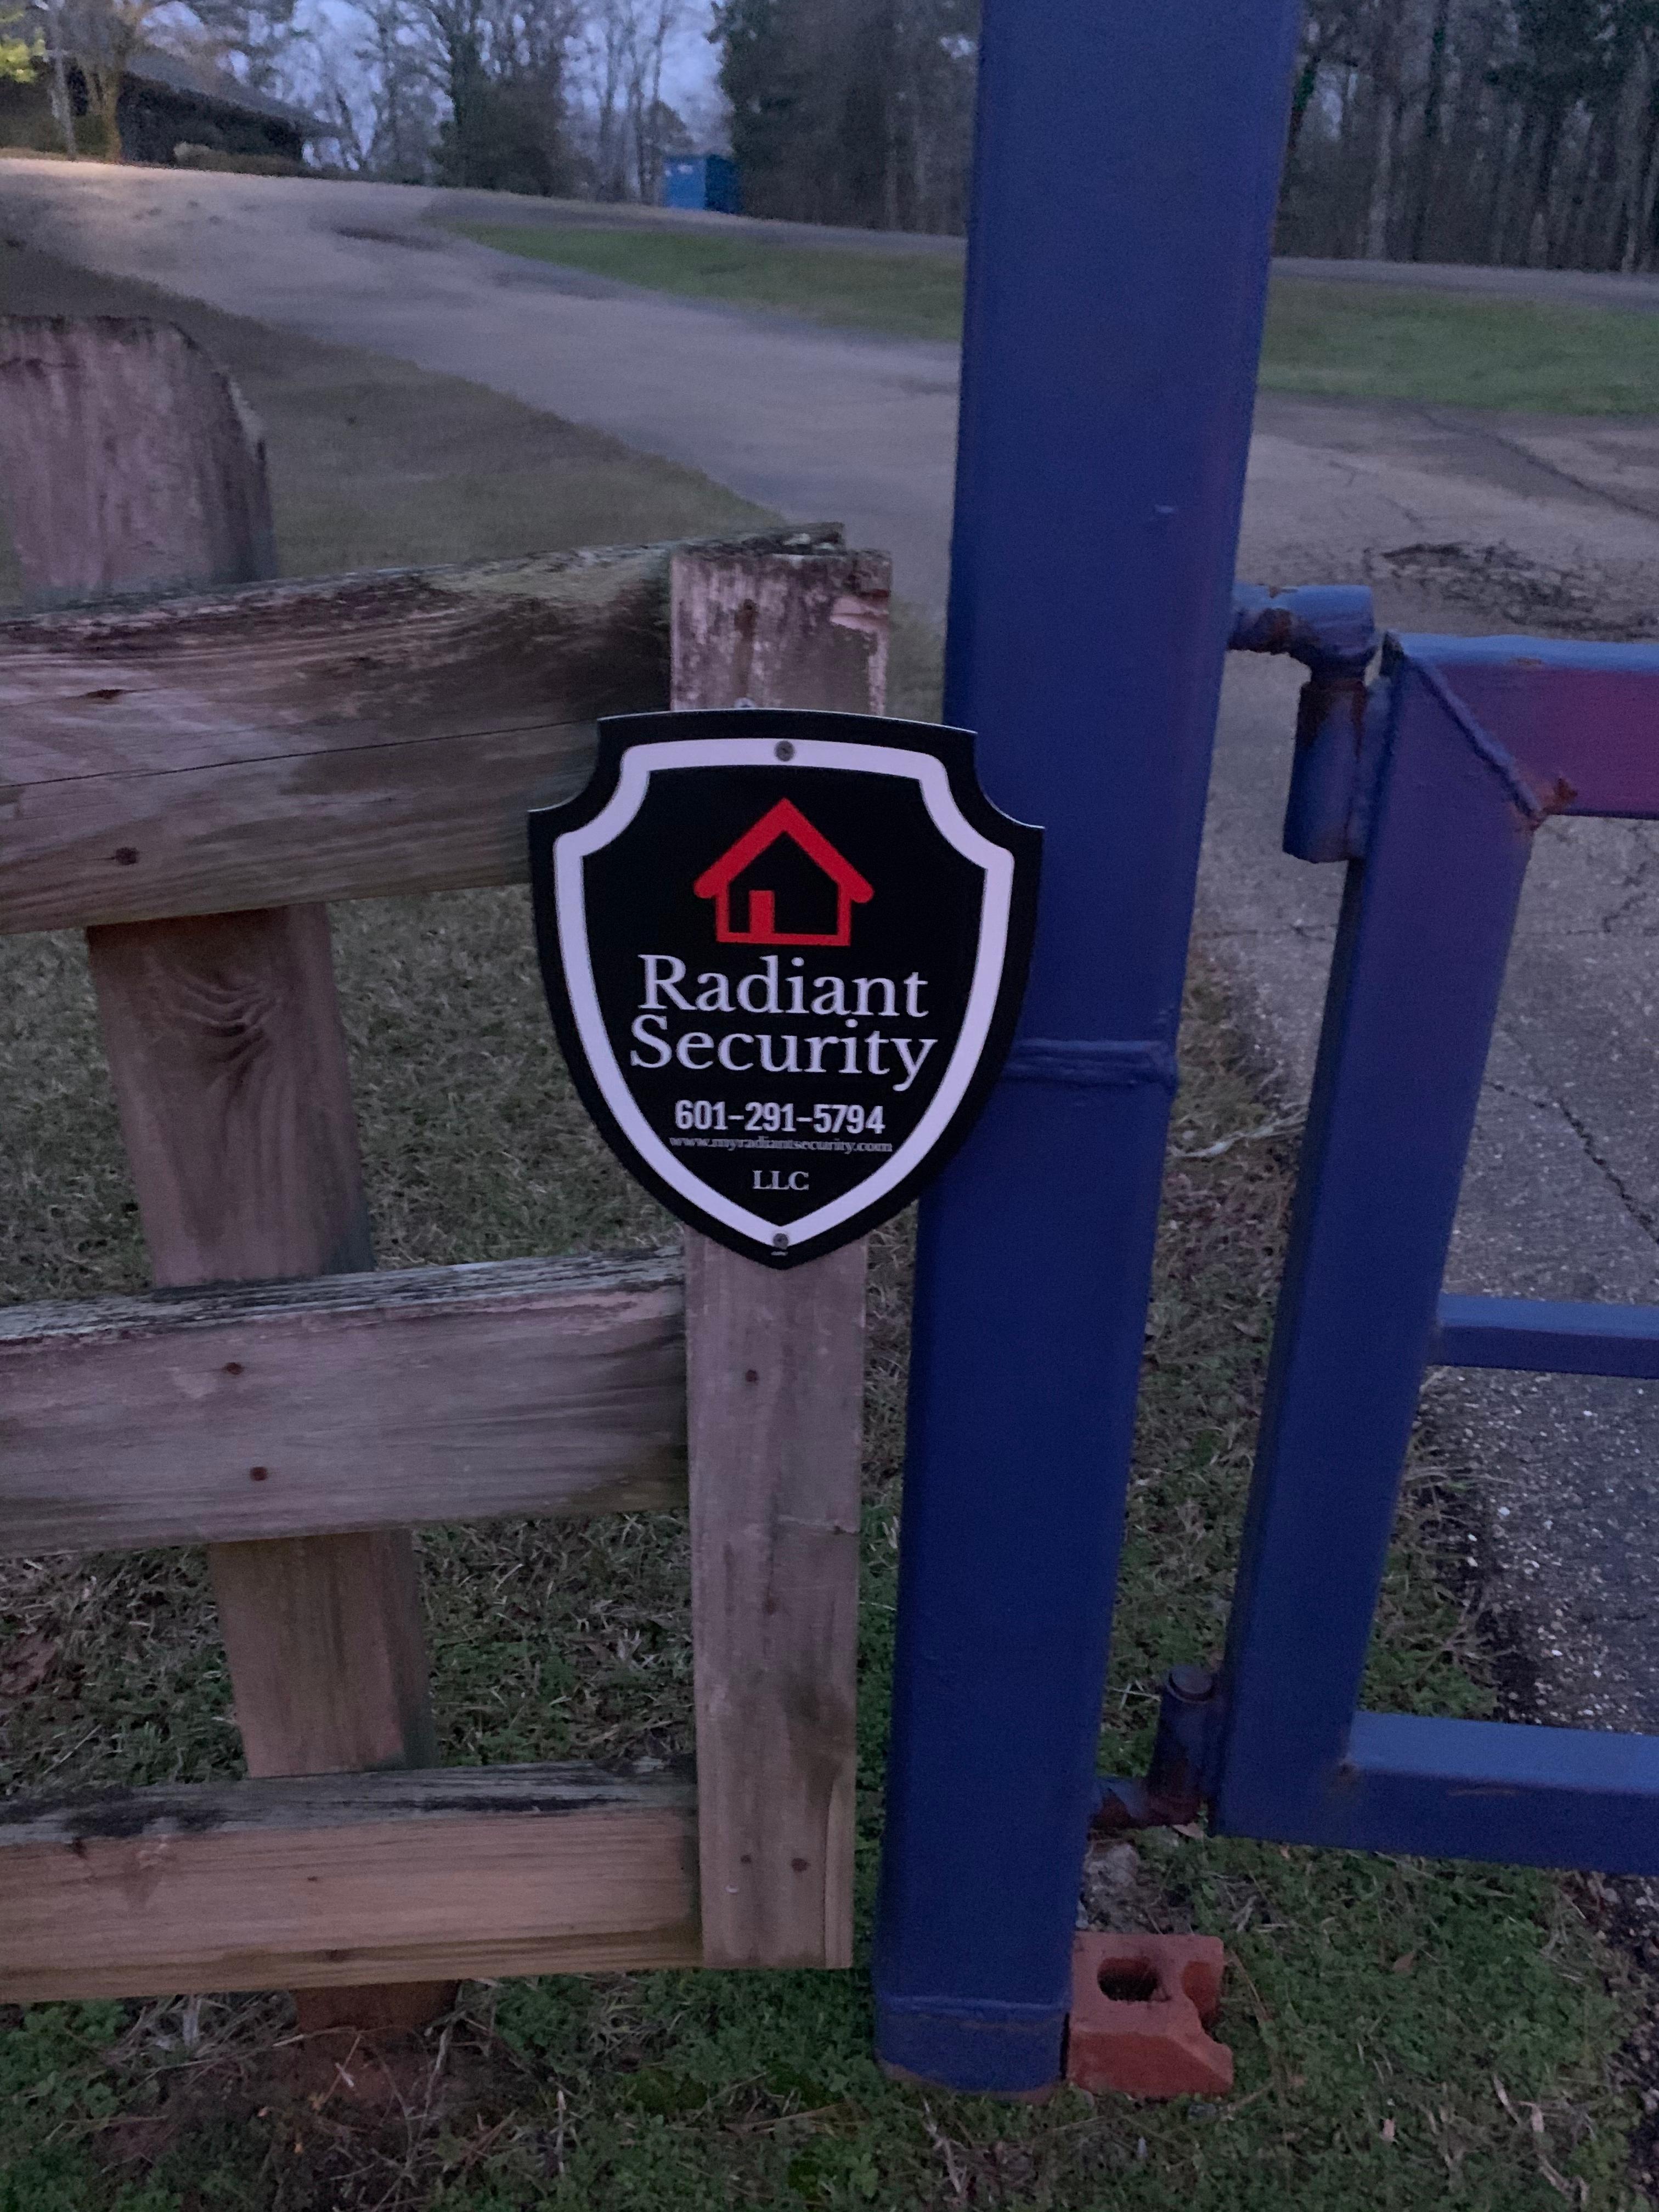 My Radiant Security